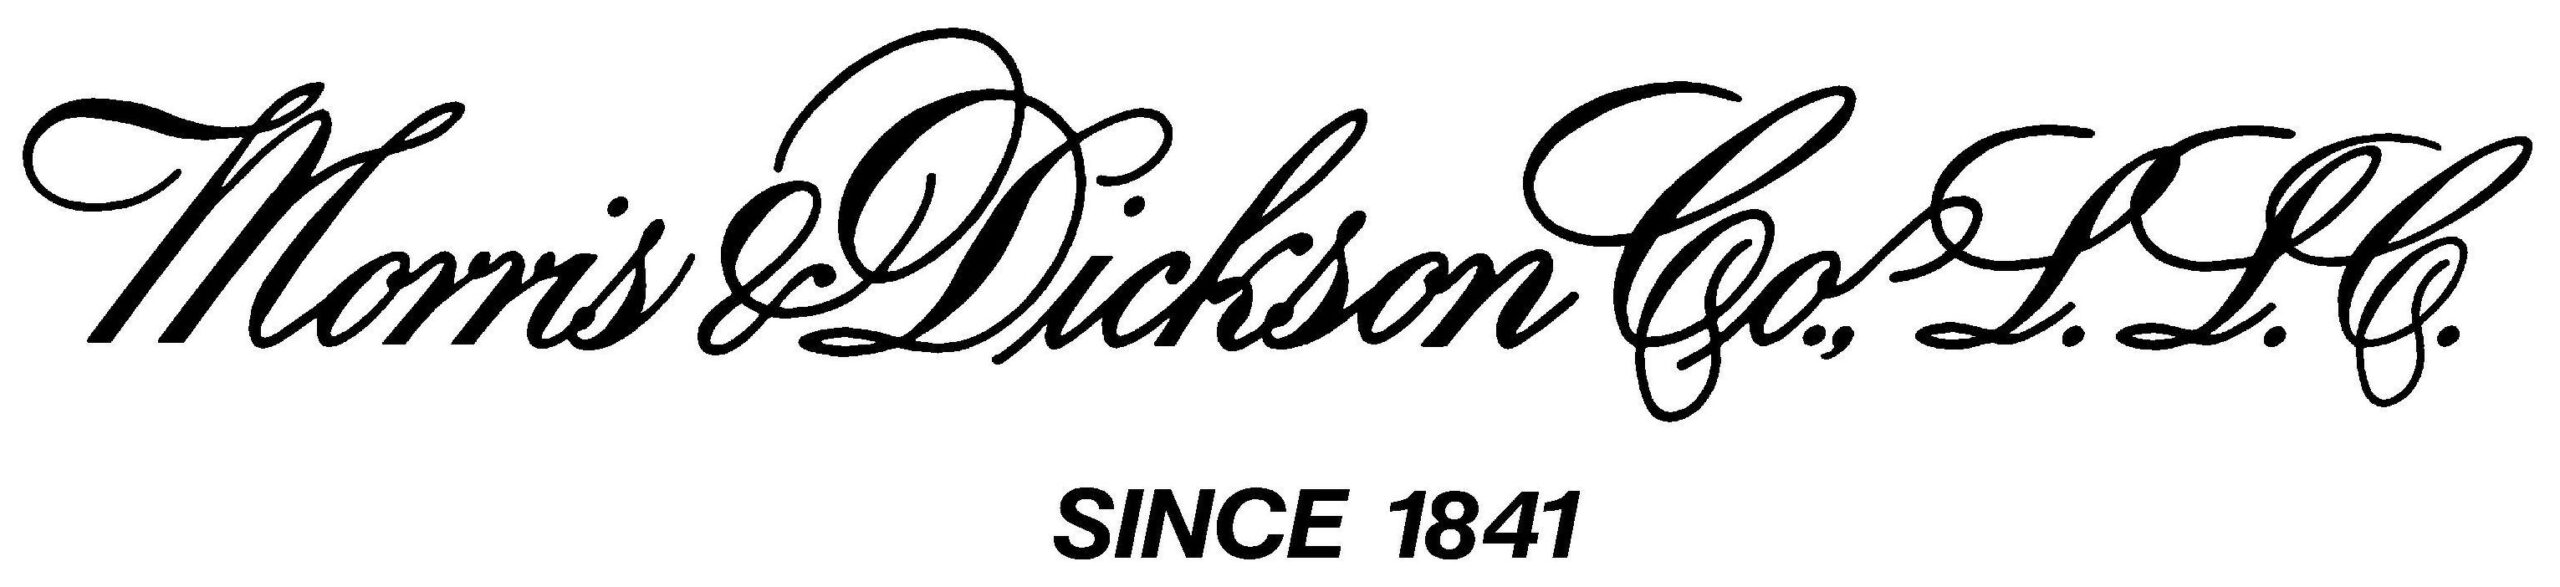 Morris & Dickson Co., LLC image